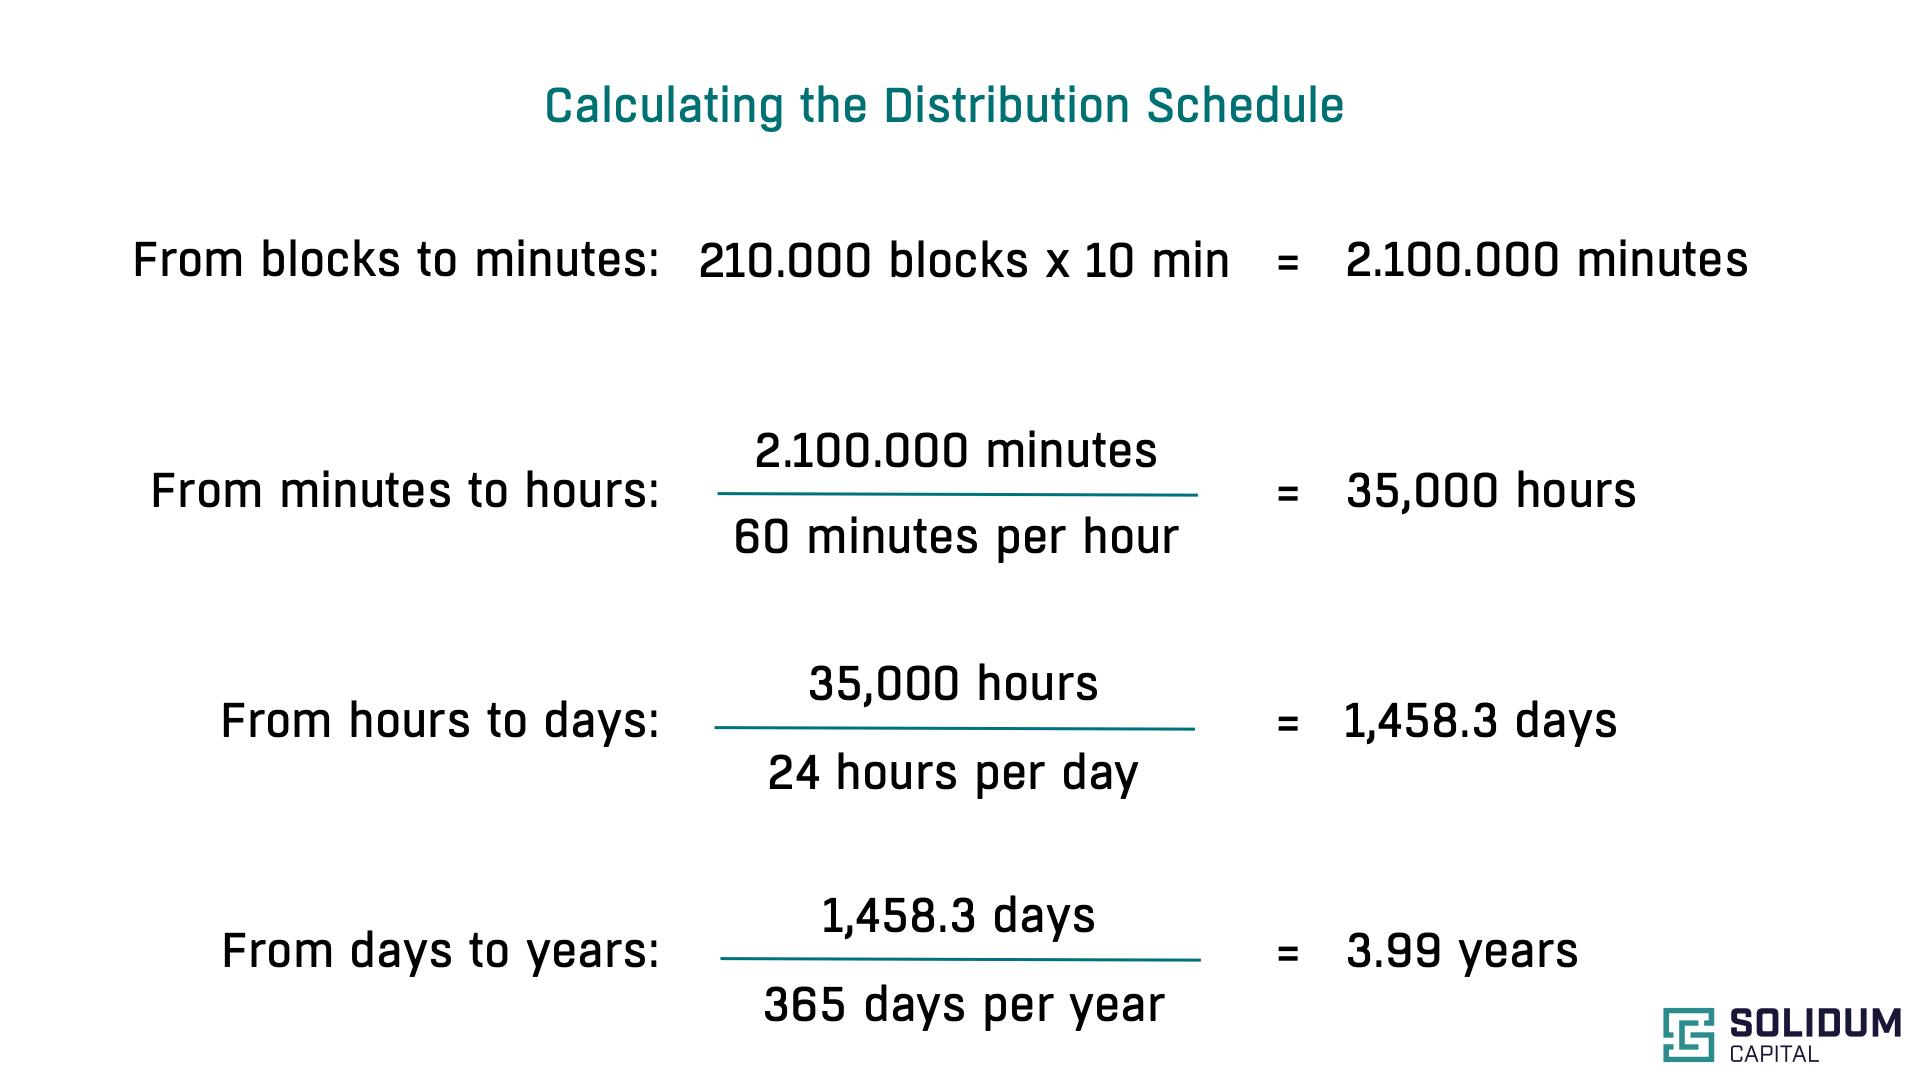 Distribution Schedule Calculation